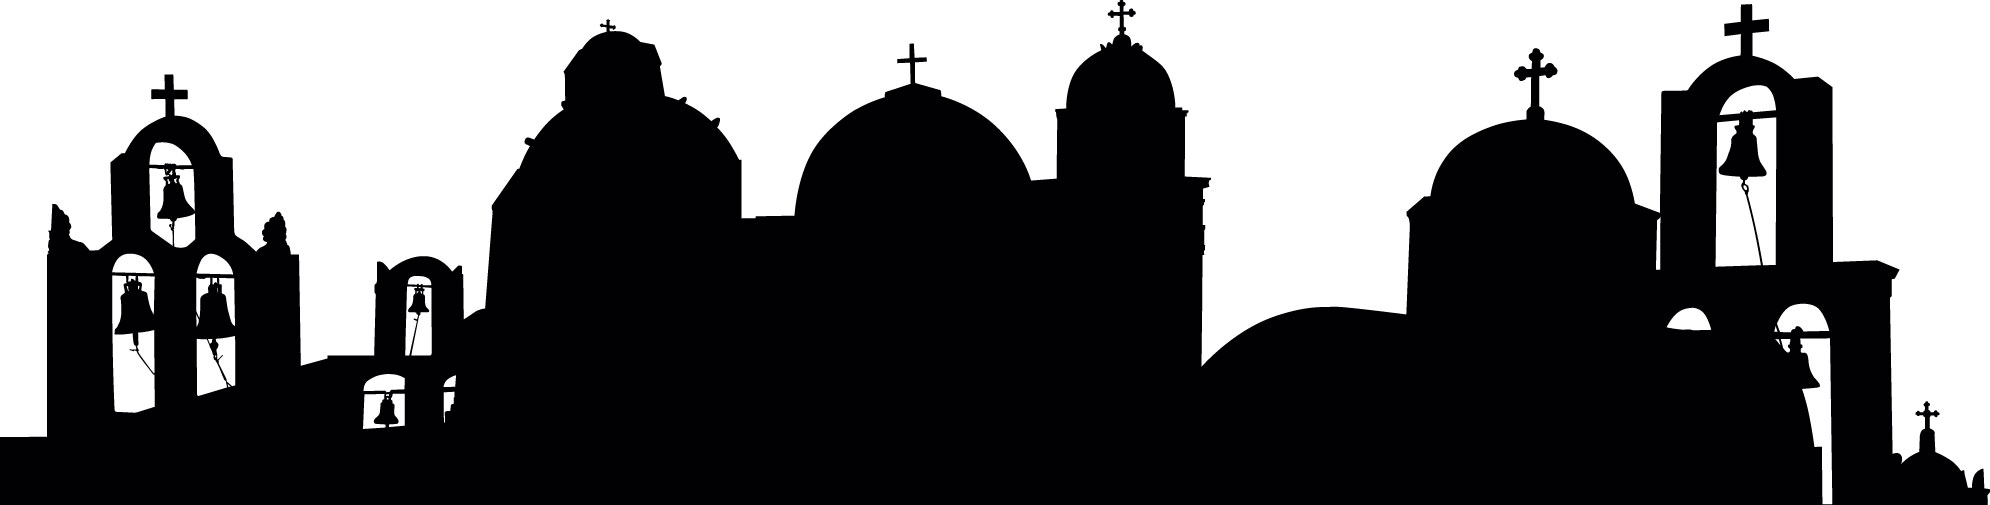 Наклейка «Церкви»Путешествия<br><br>